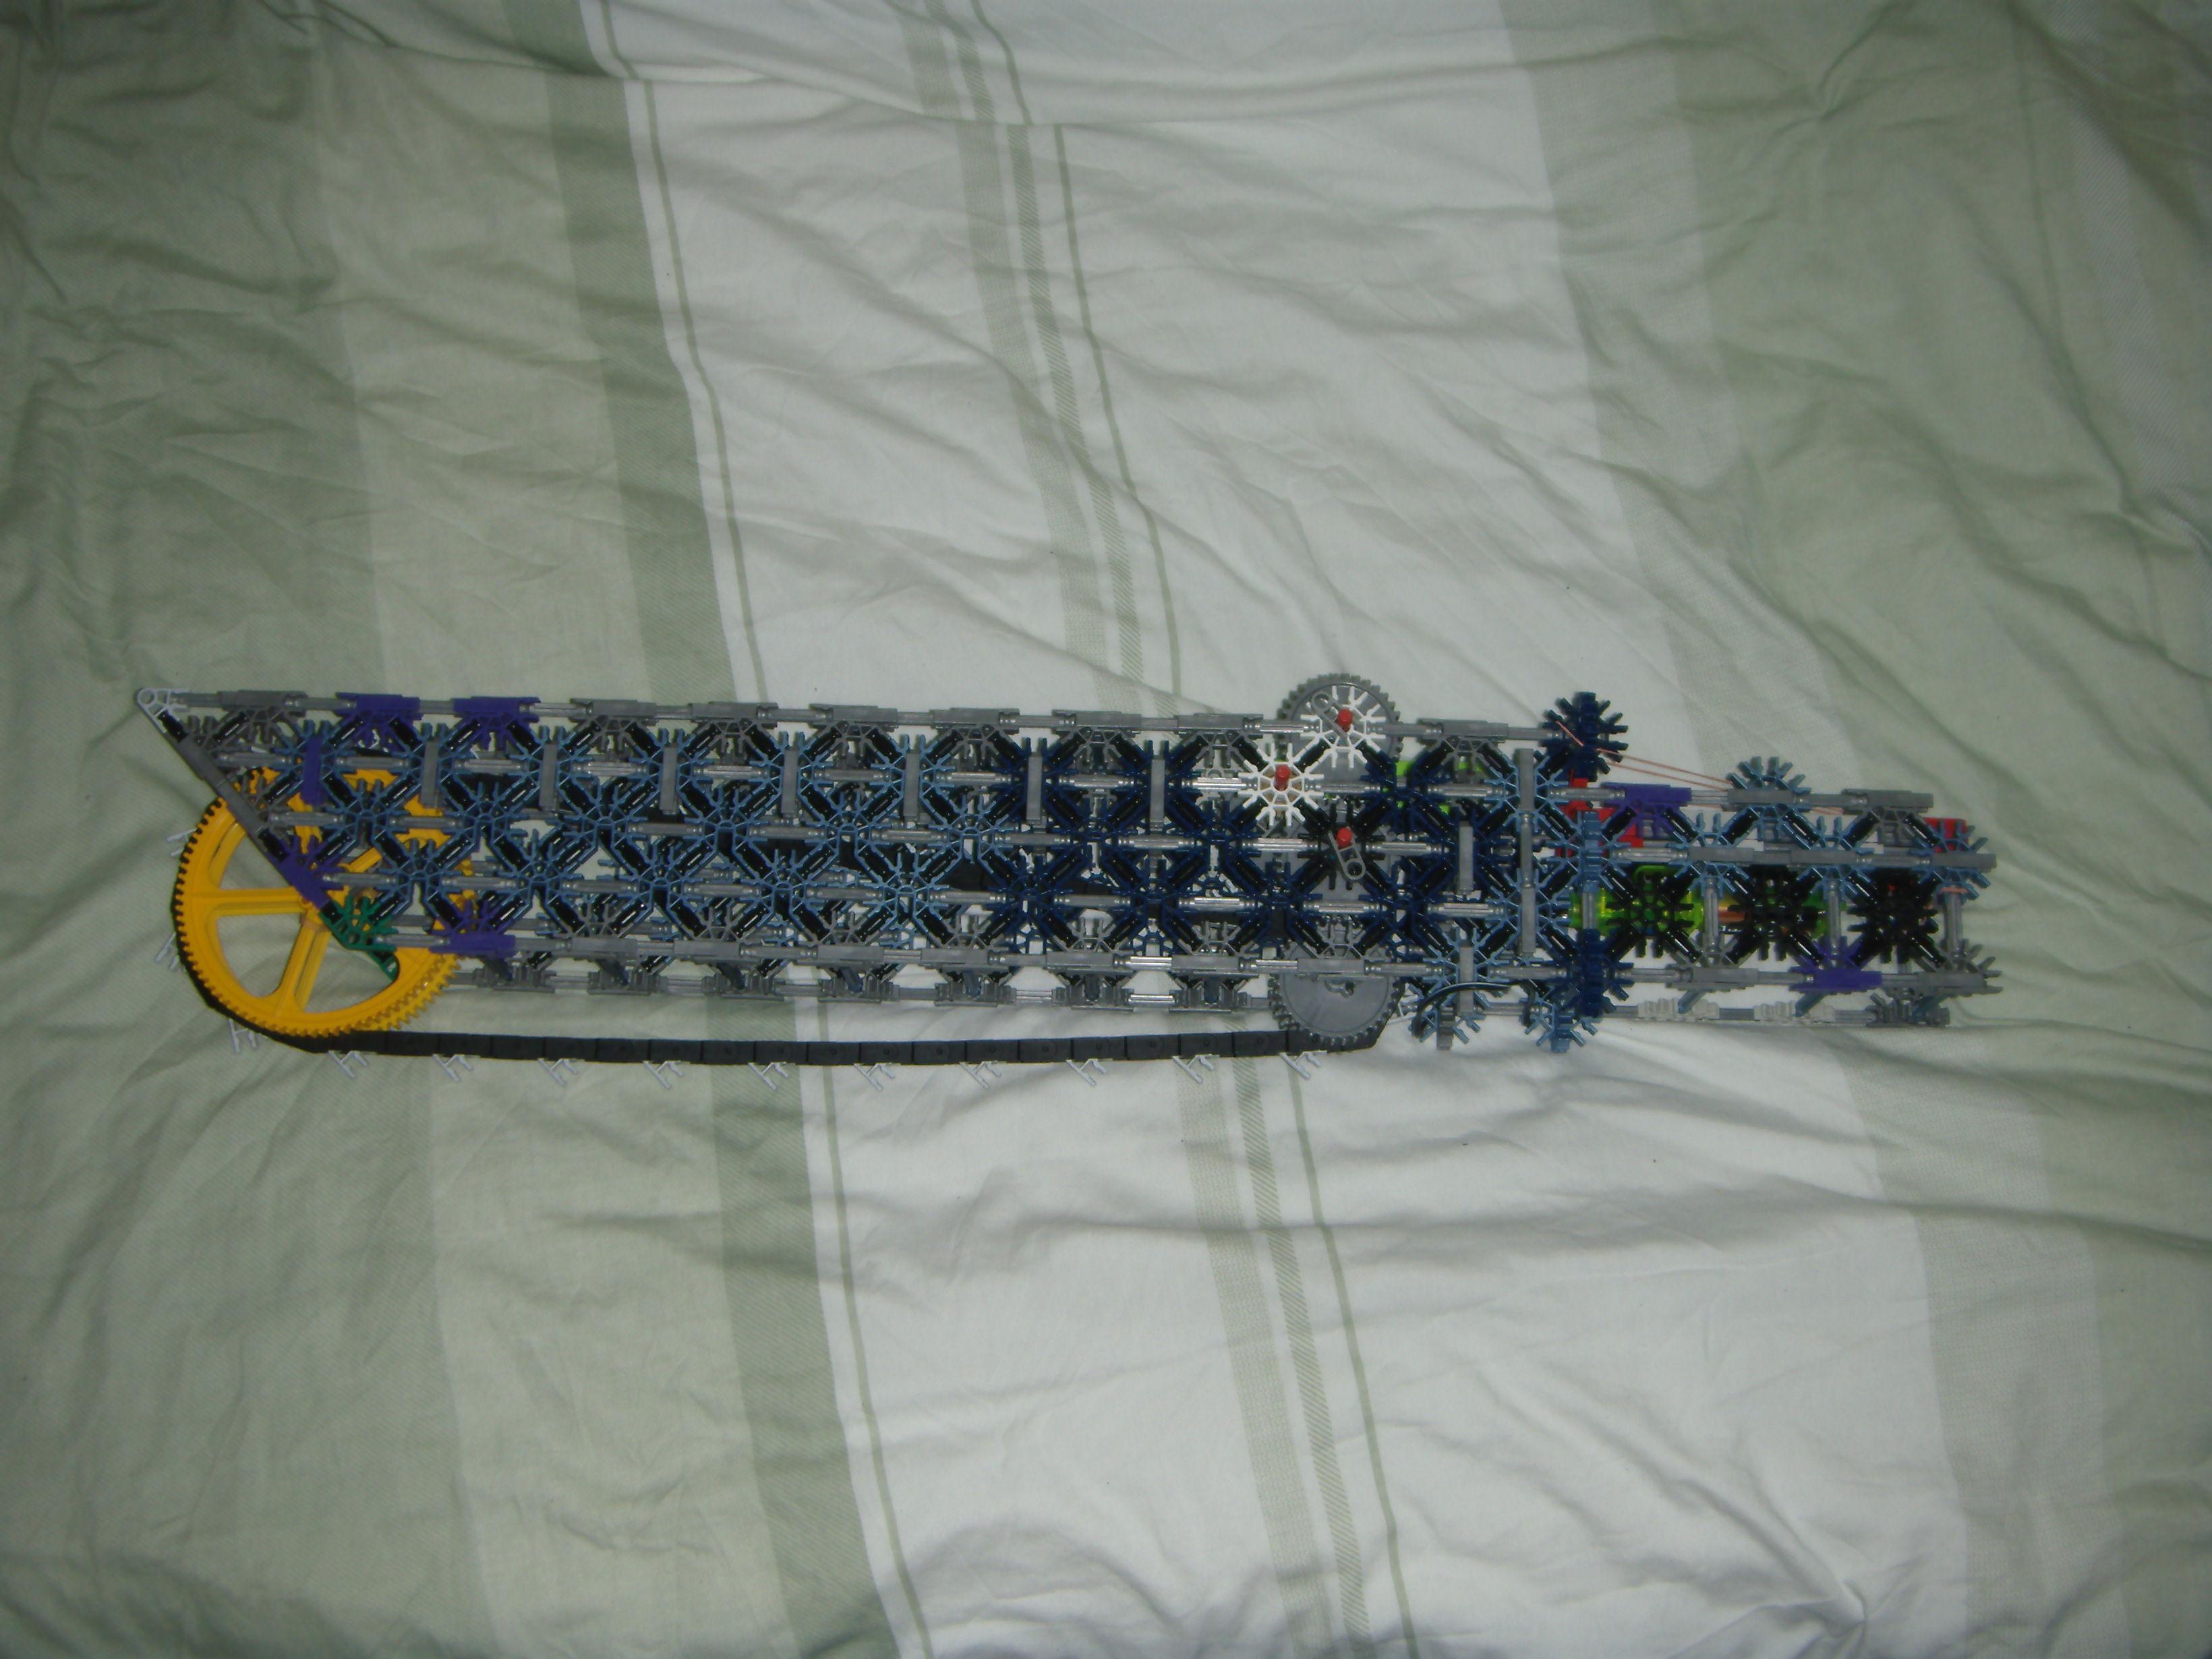 dawn of war based chain sword